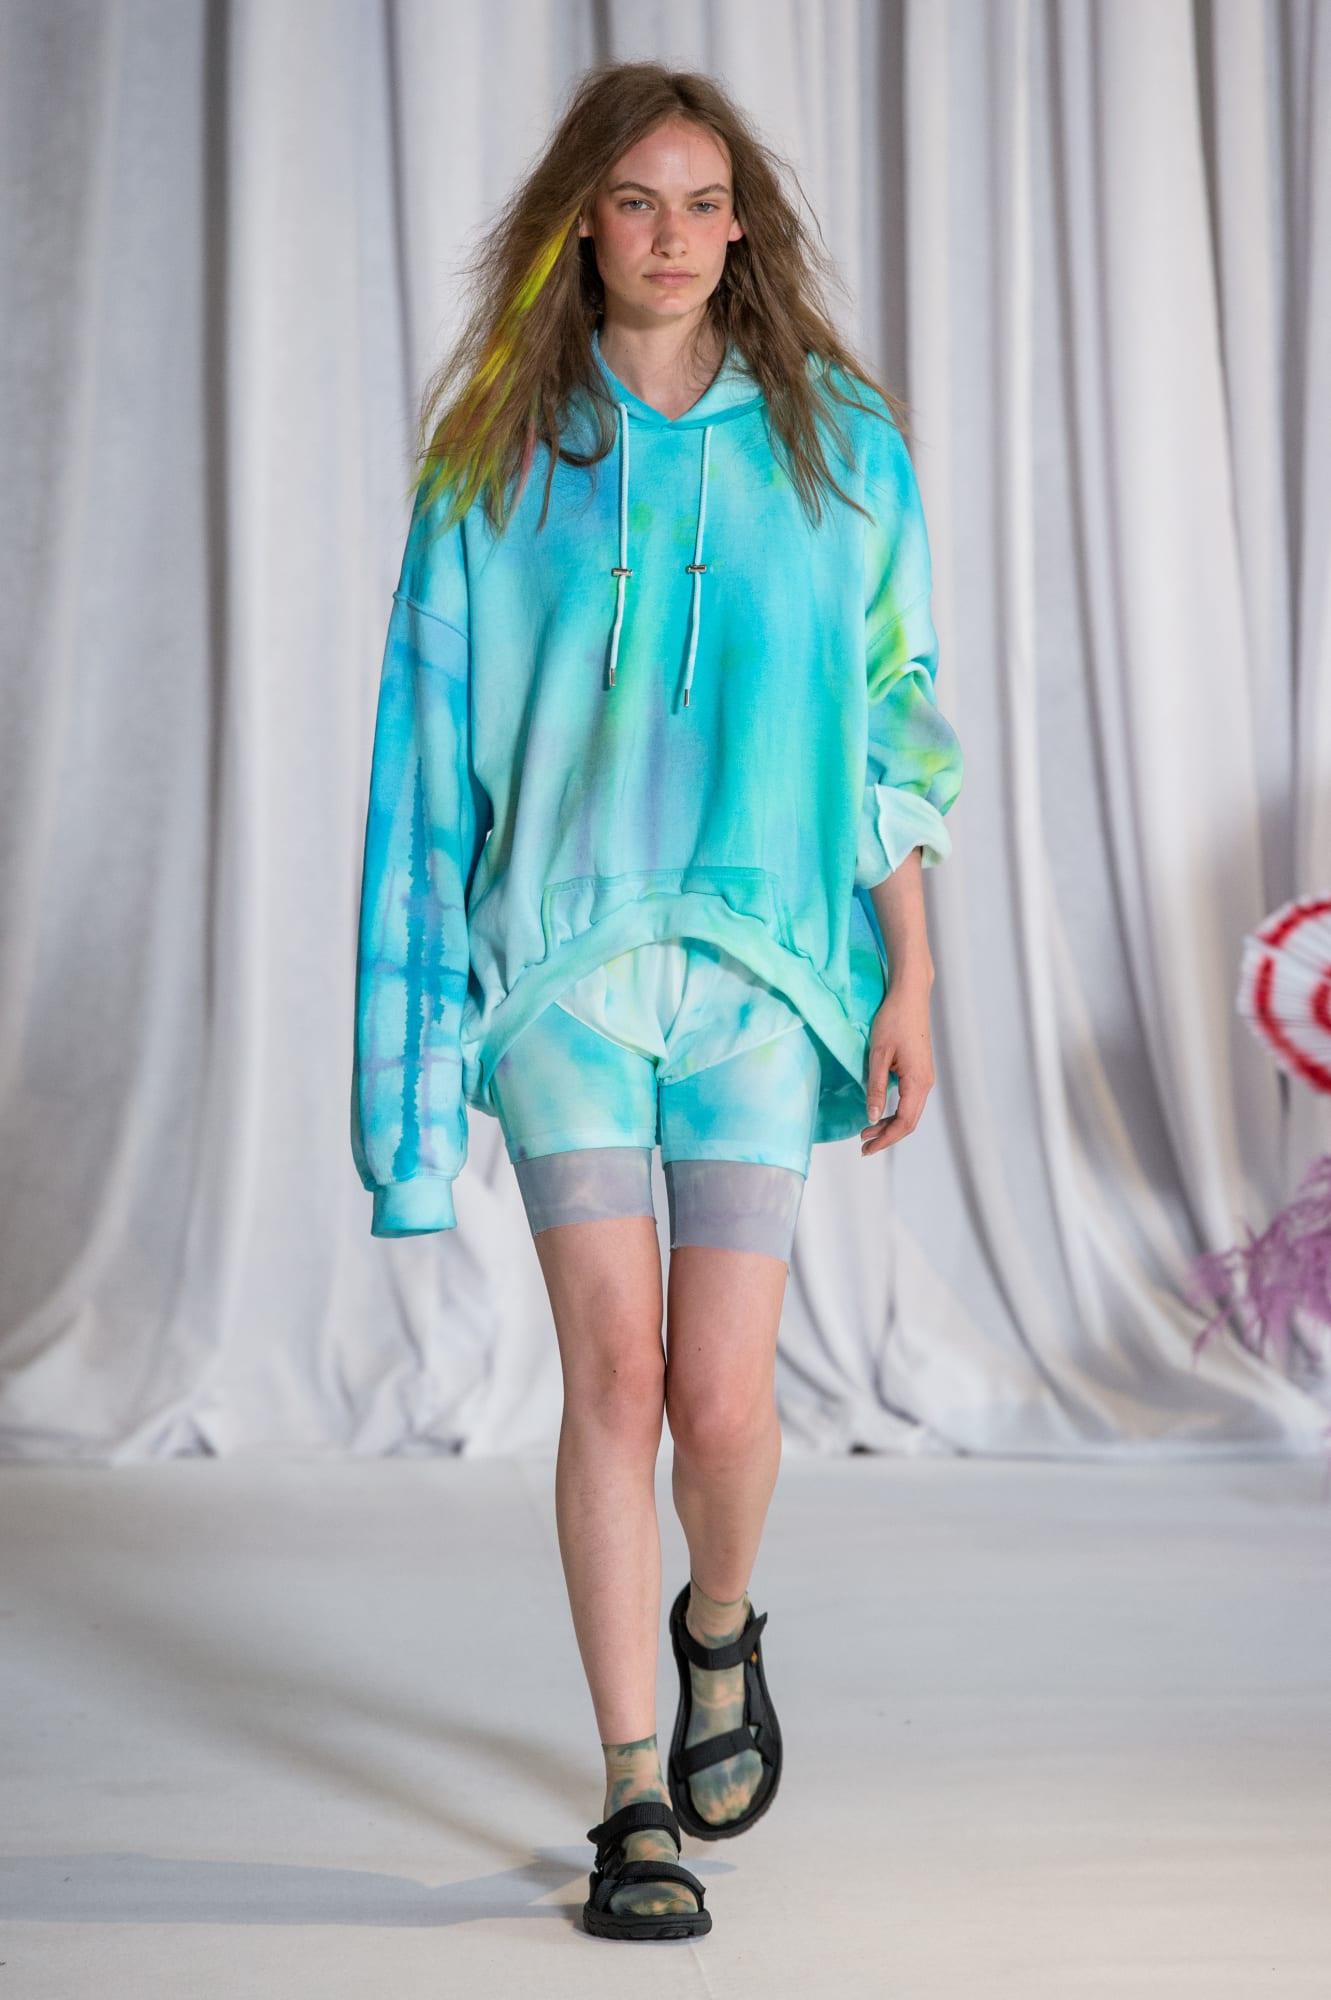 fashion-week-spring-2019-trend-bike-shorts-collina-strada-2.jpg